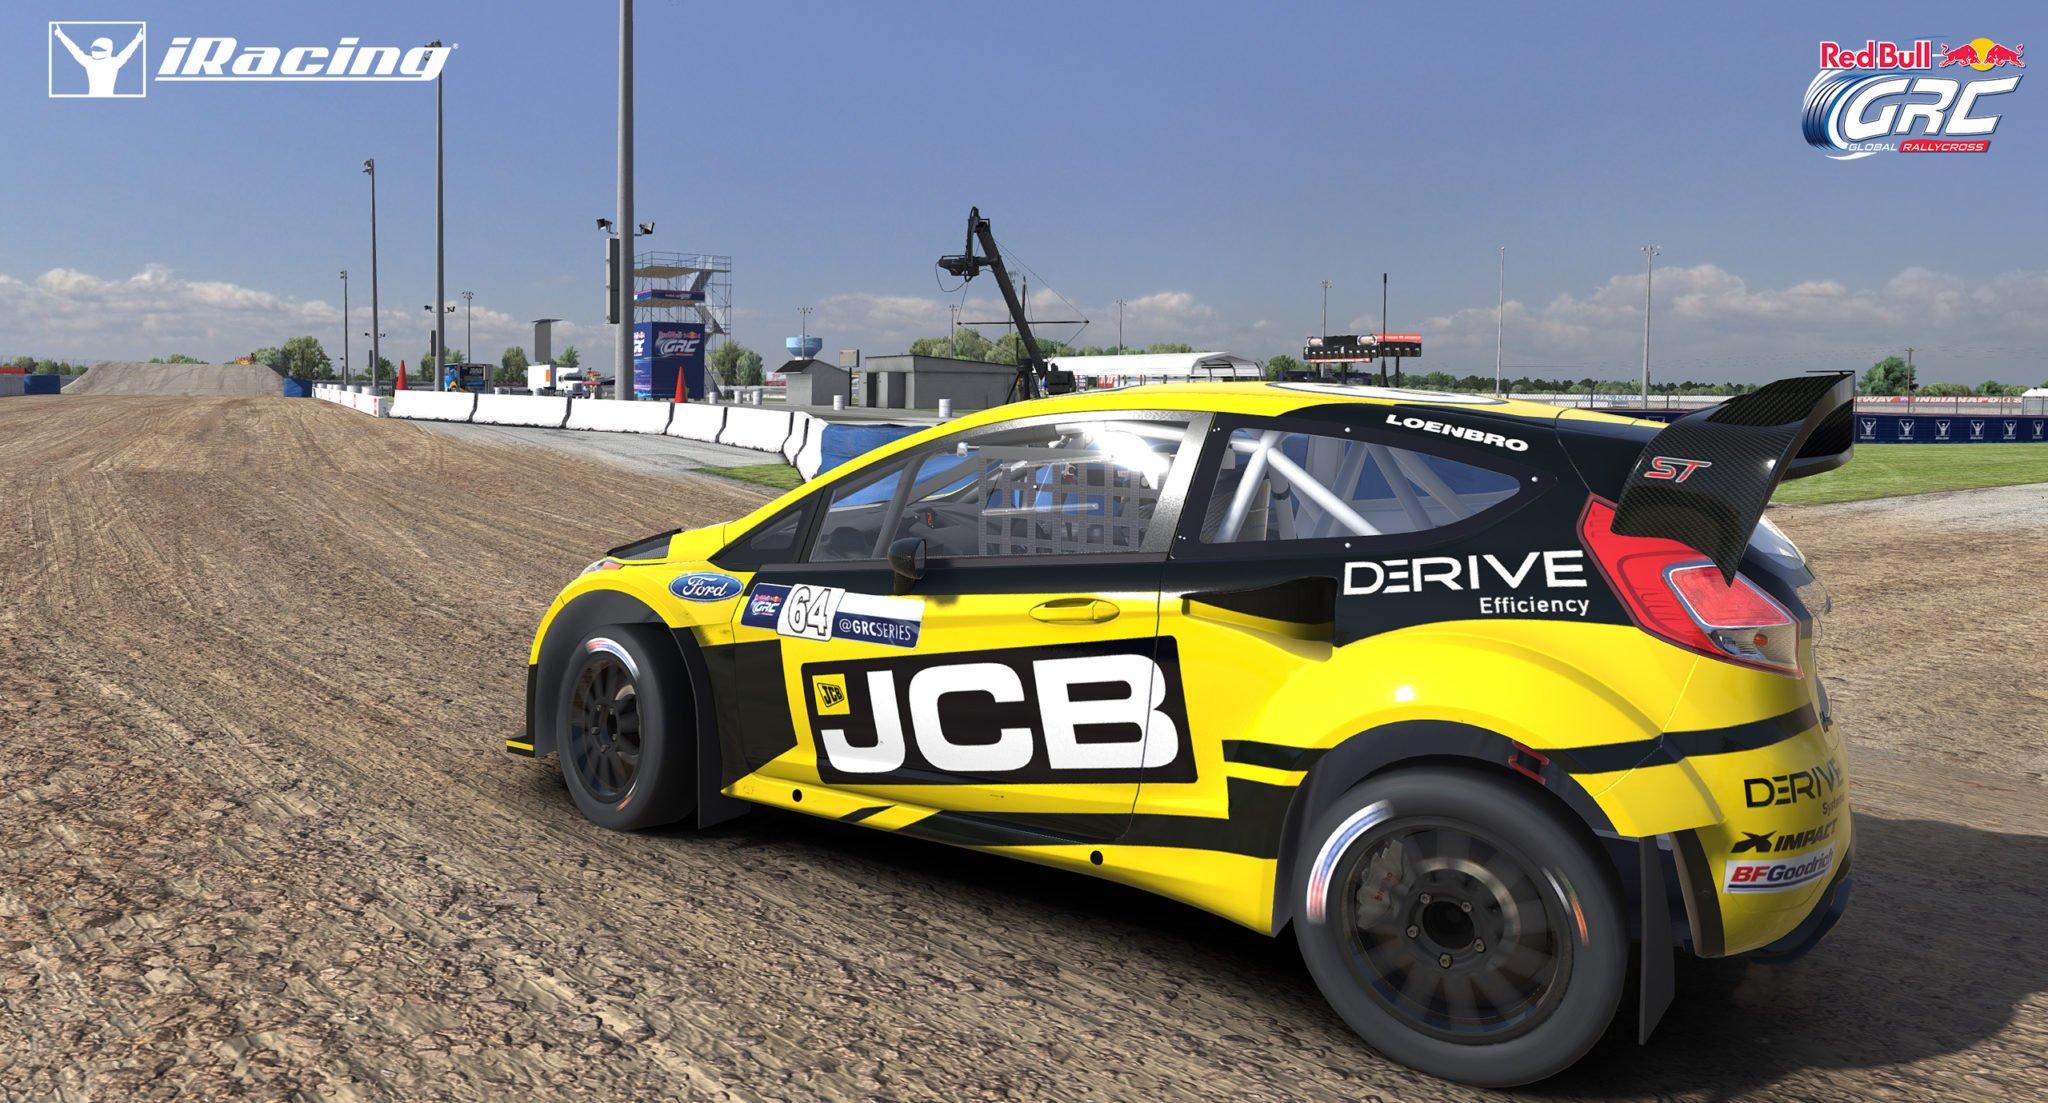 iRacing 2018 Season 1 Update Brings Rallycross, Animated Pit